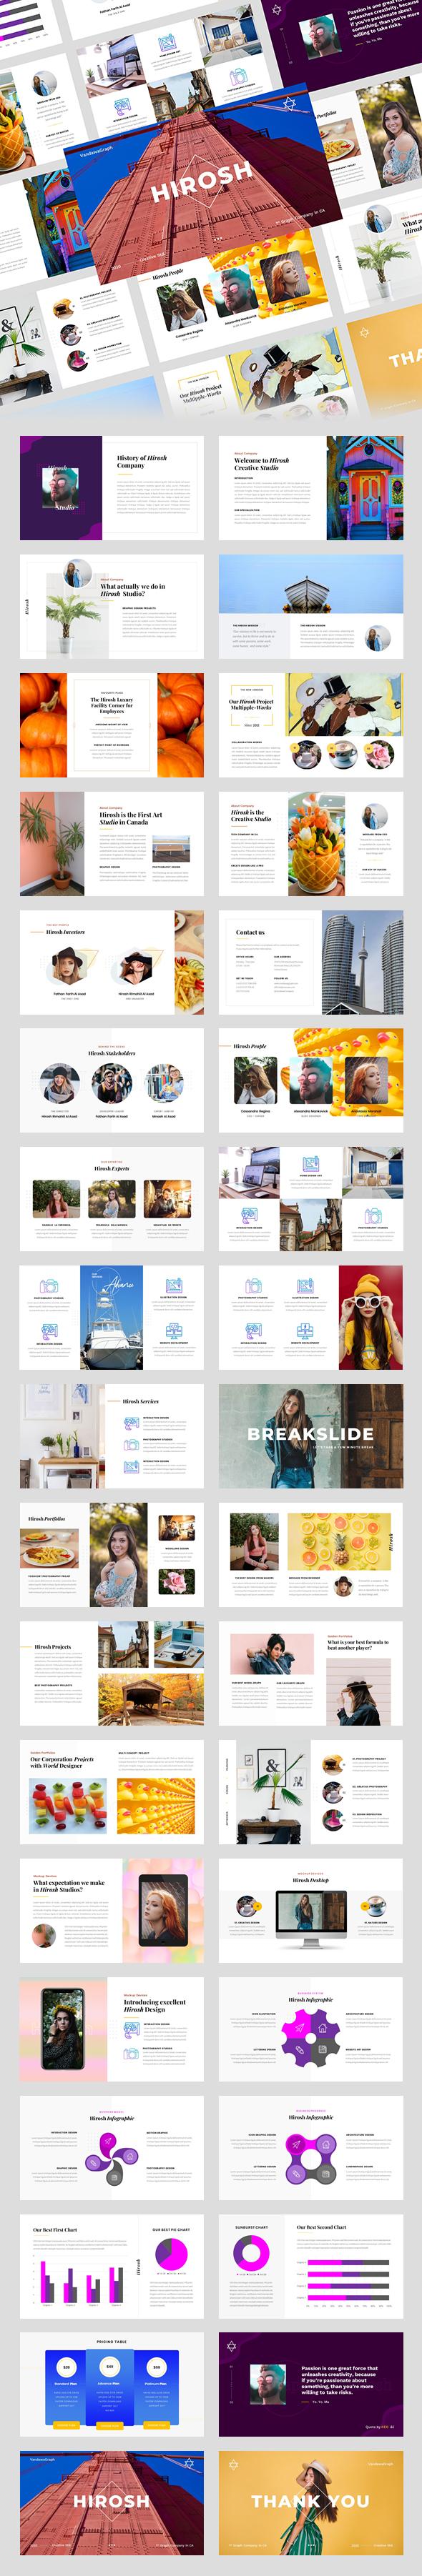 Hirosh – Creative Business PowerPoint Template